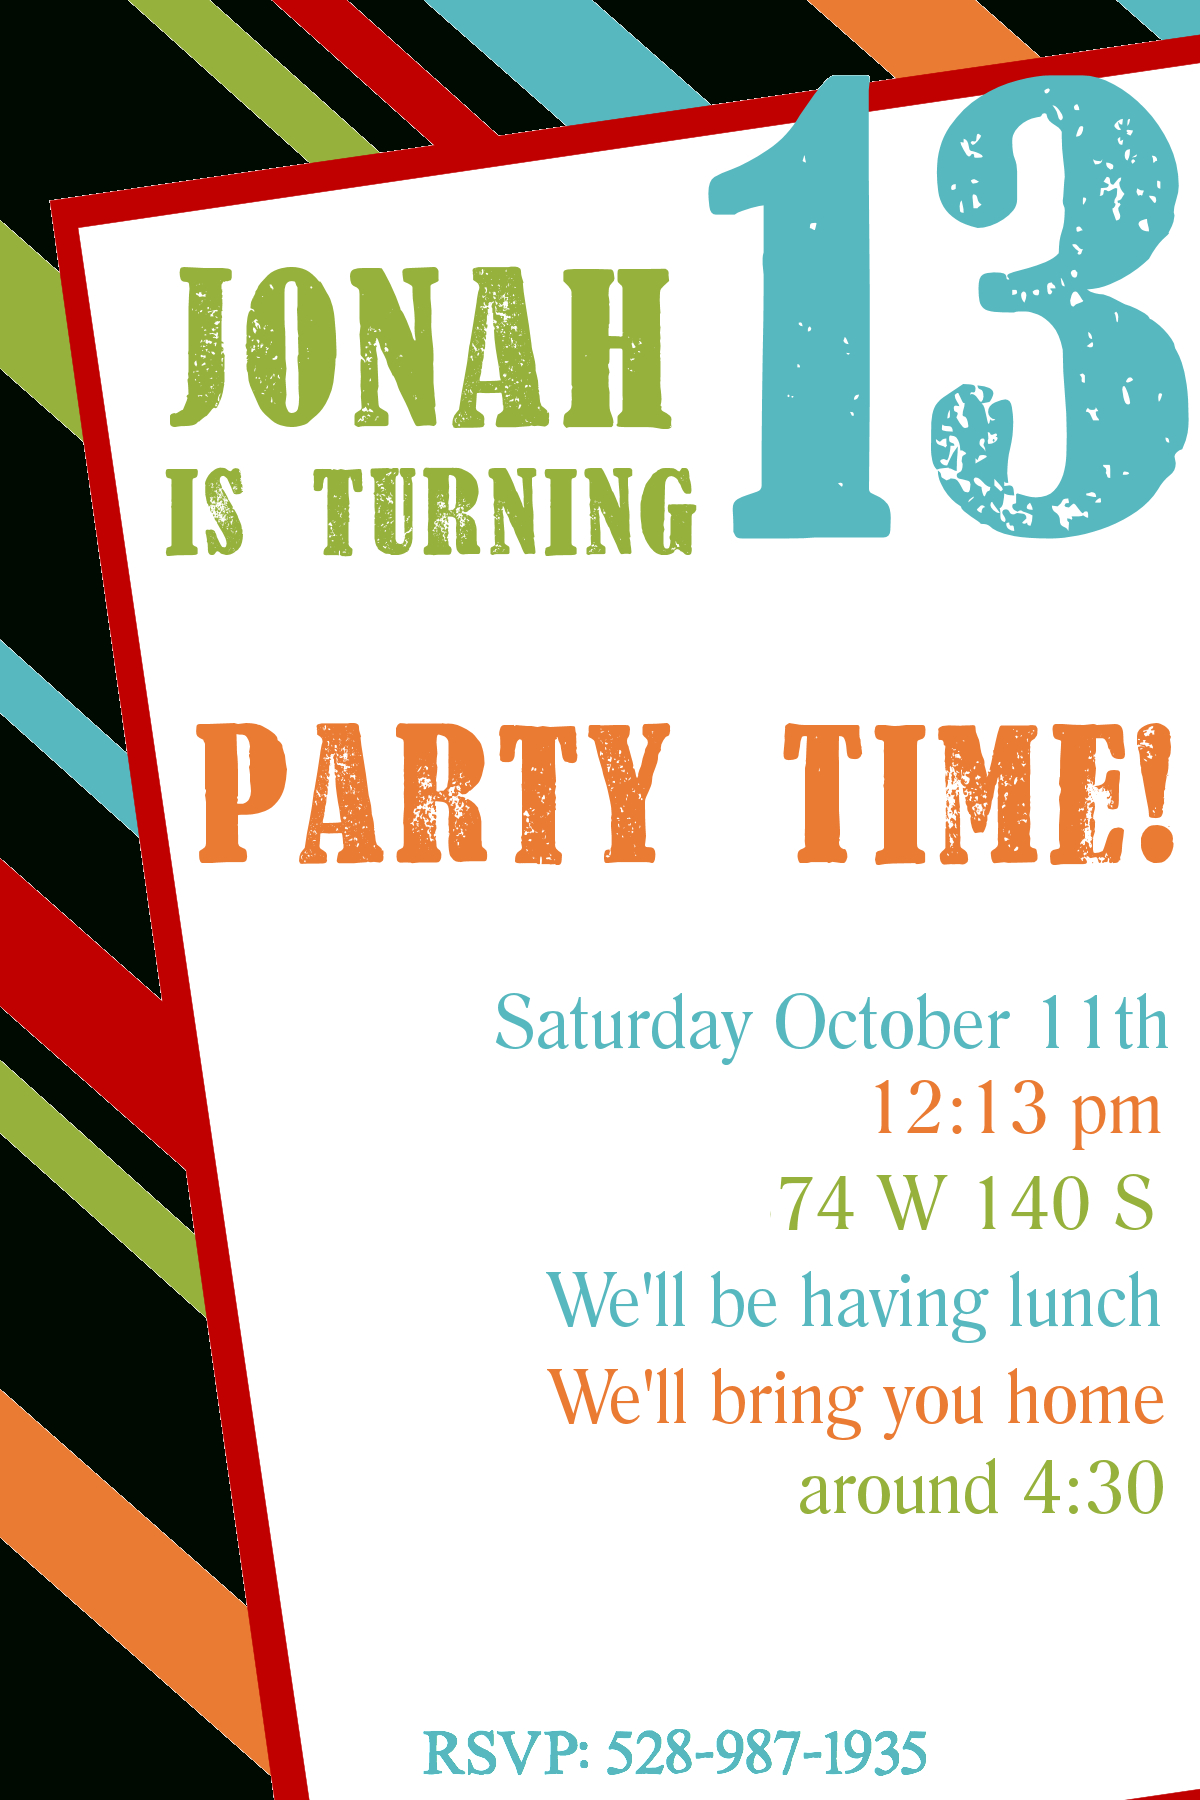 Free Printable Birthday Invitation Templates | Printables | Free - Free Stork Party Invitations Printable